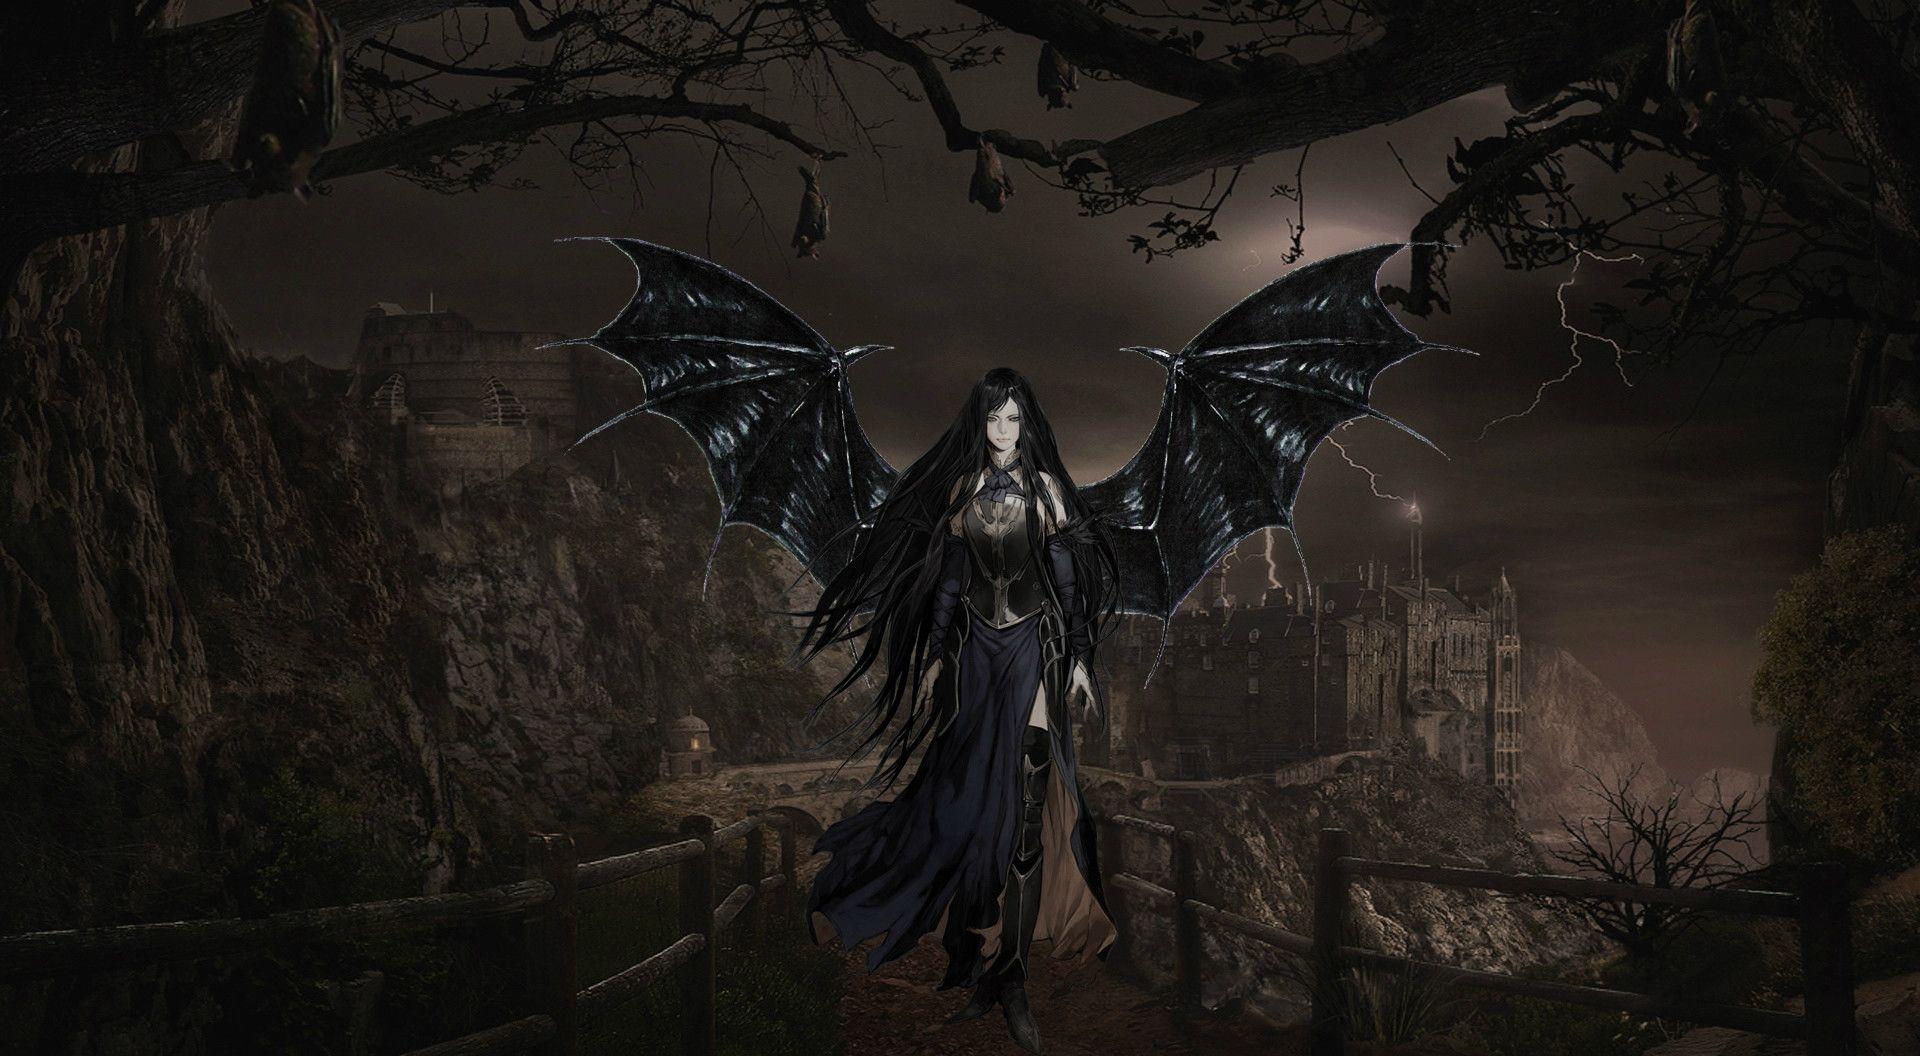 Gothic Vampire Wallpaper